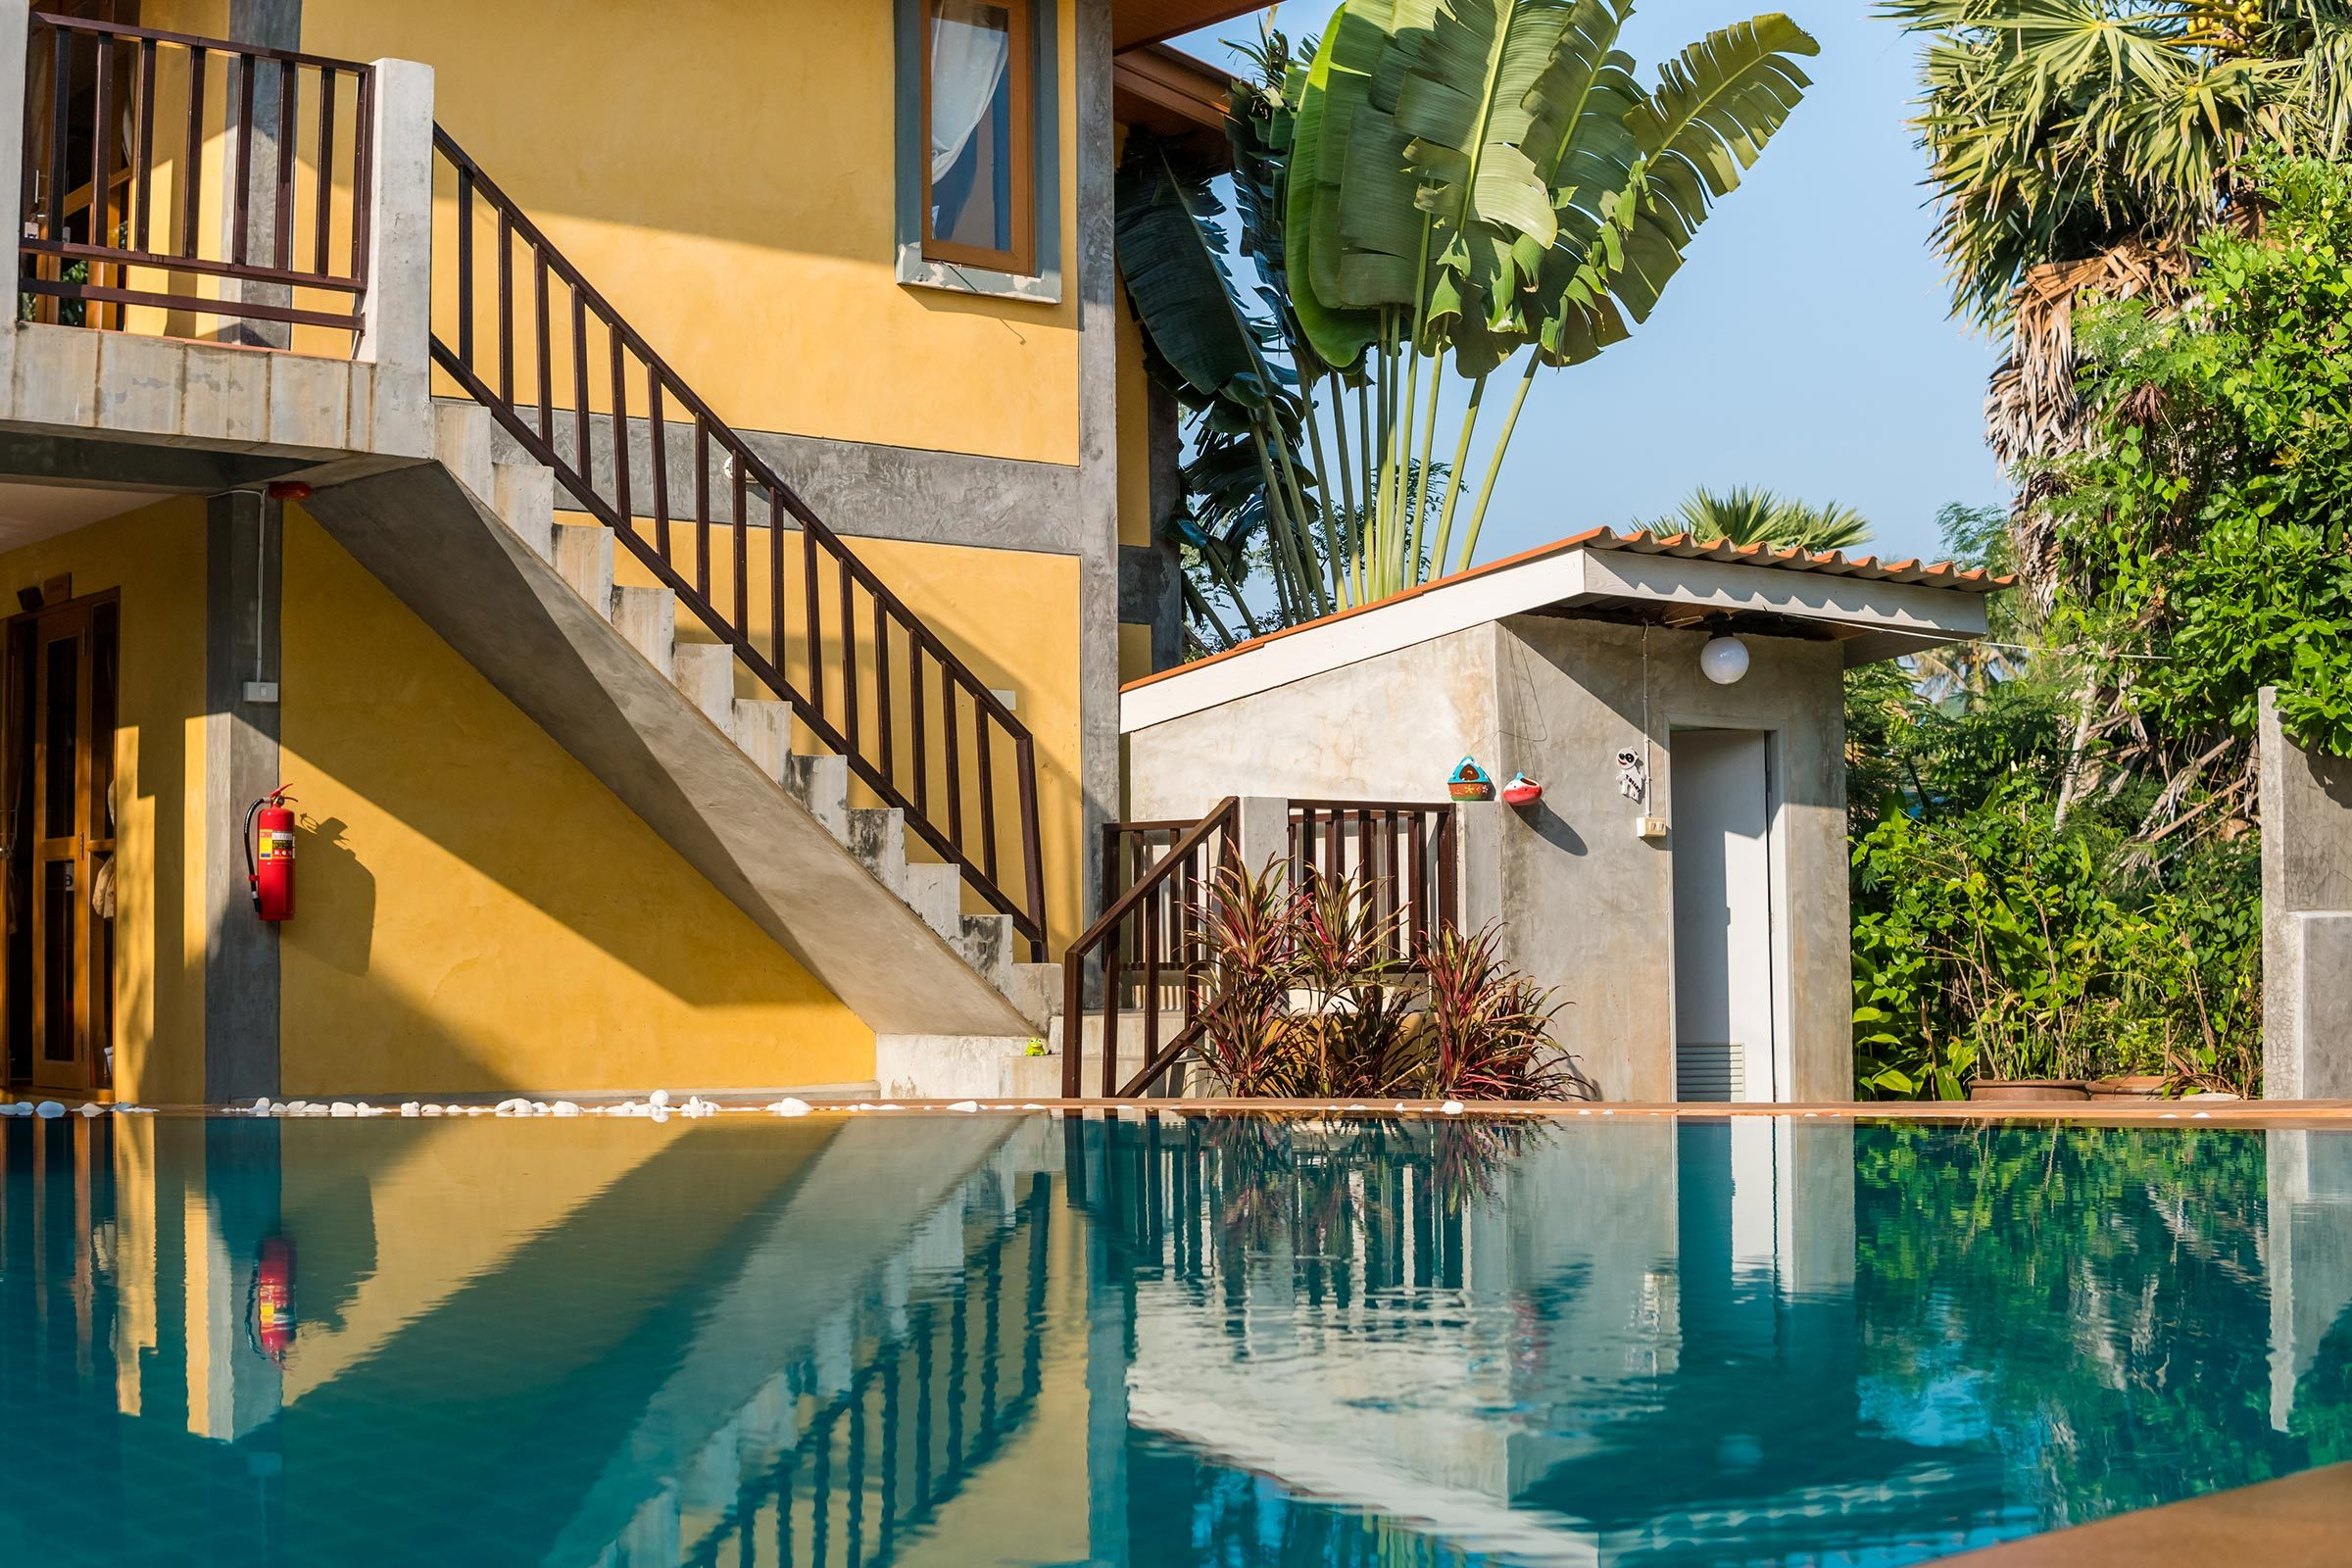 Outdoor inground residential swimming pool in backyard